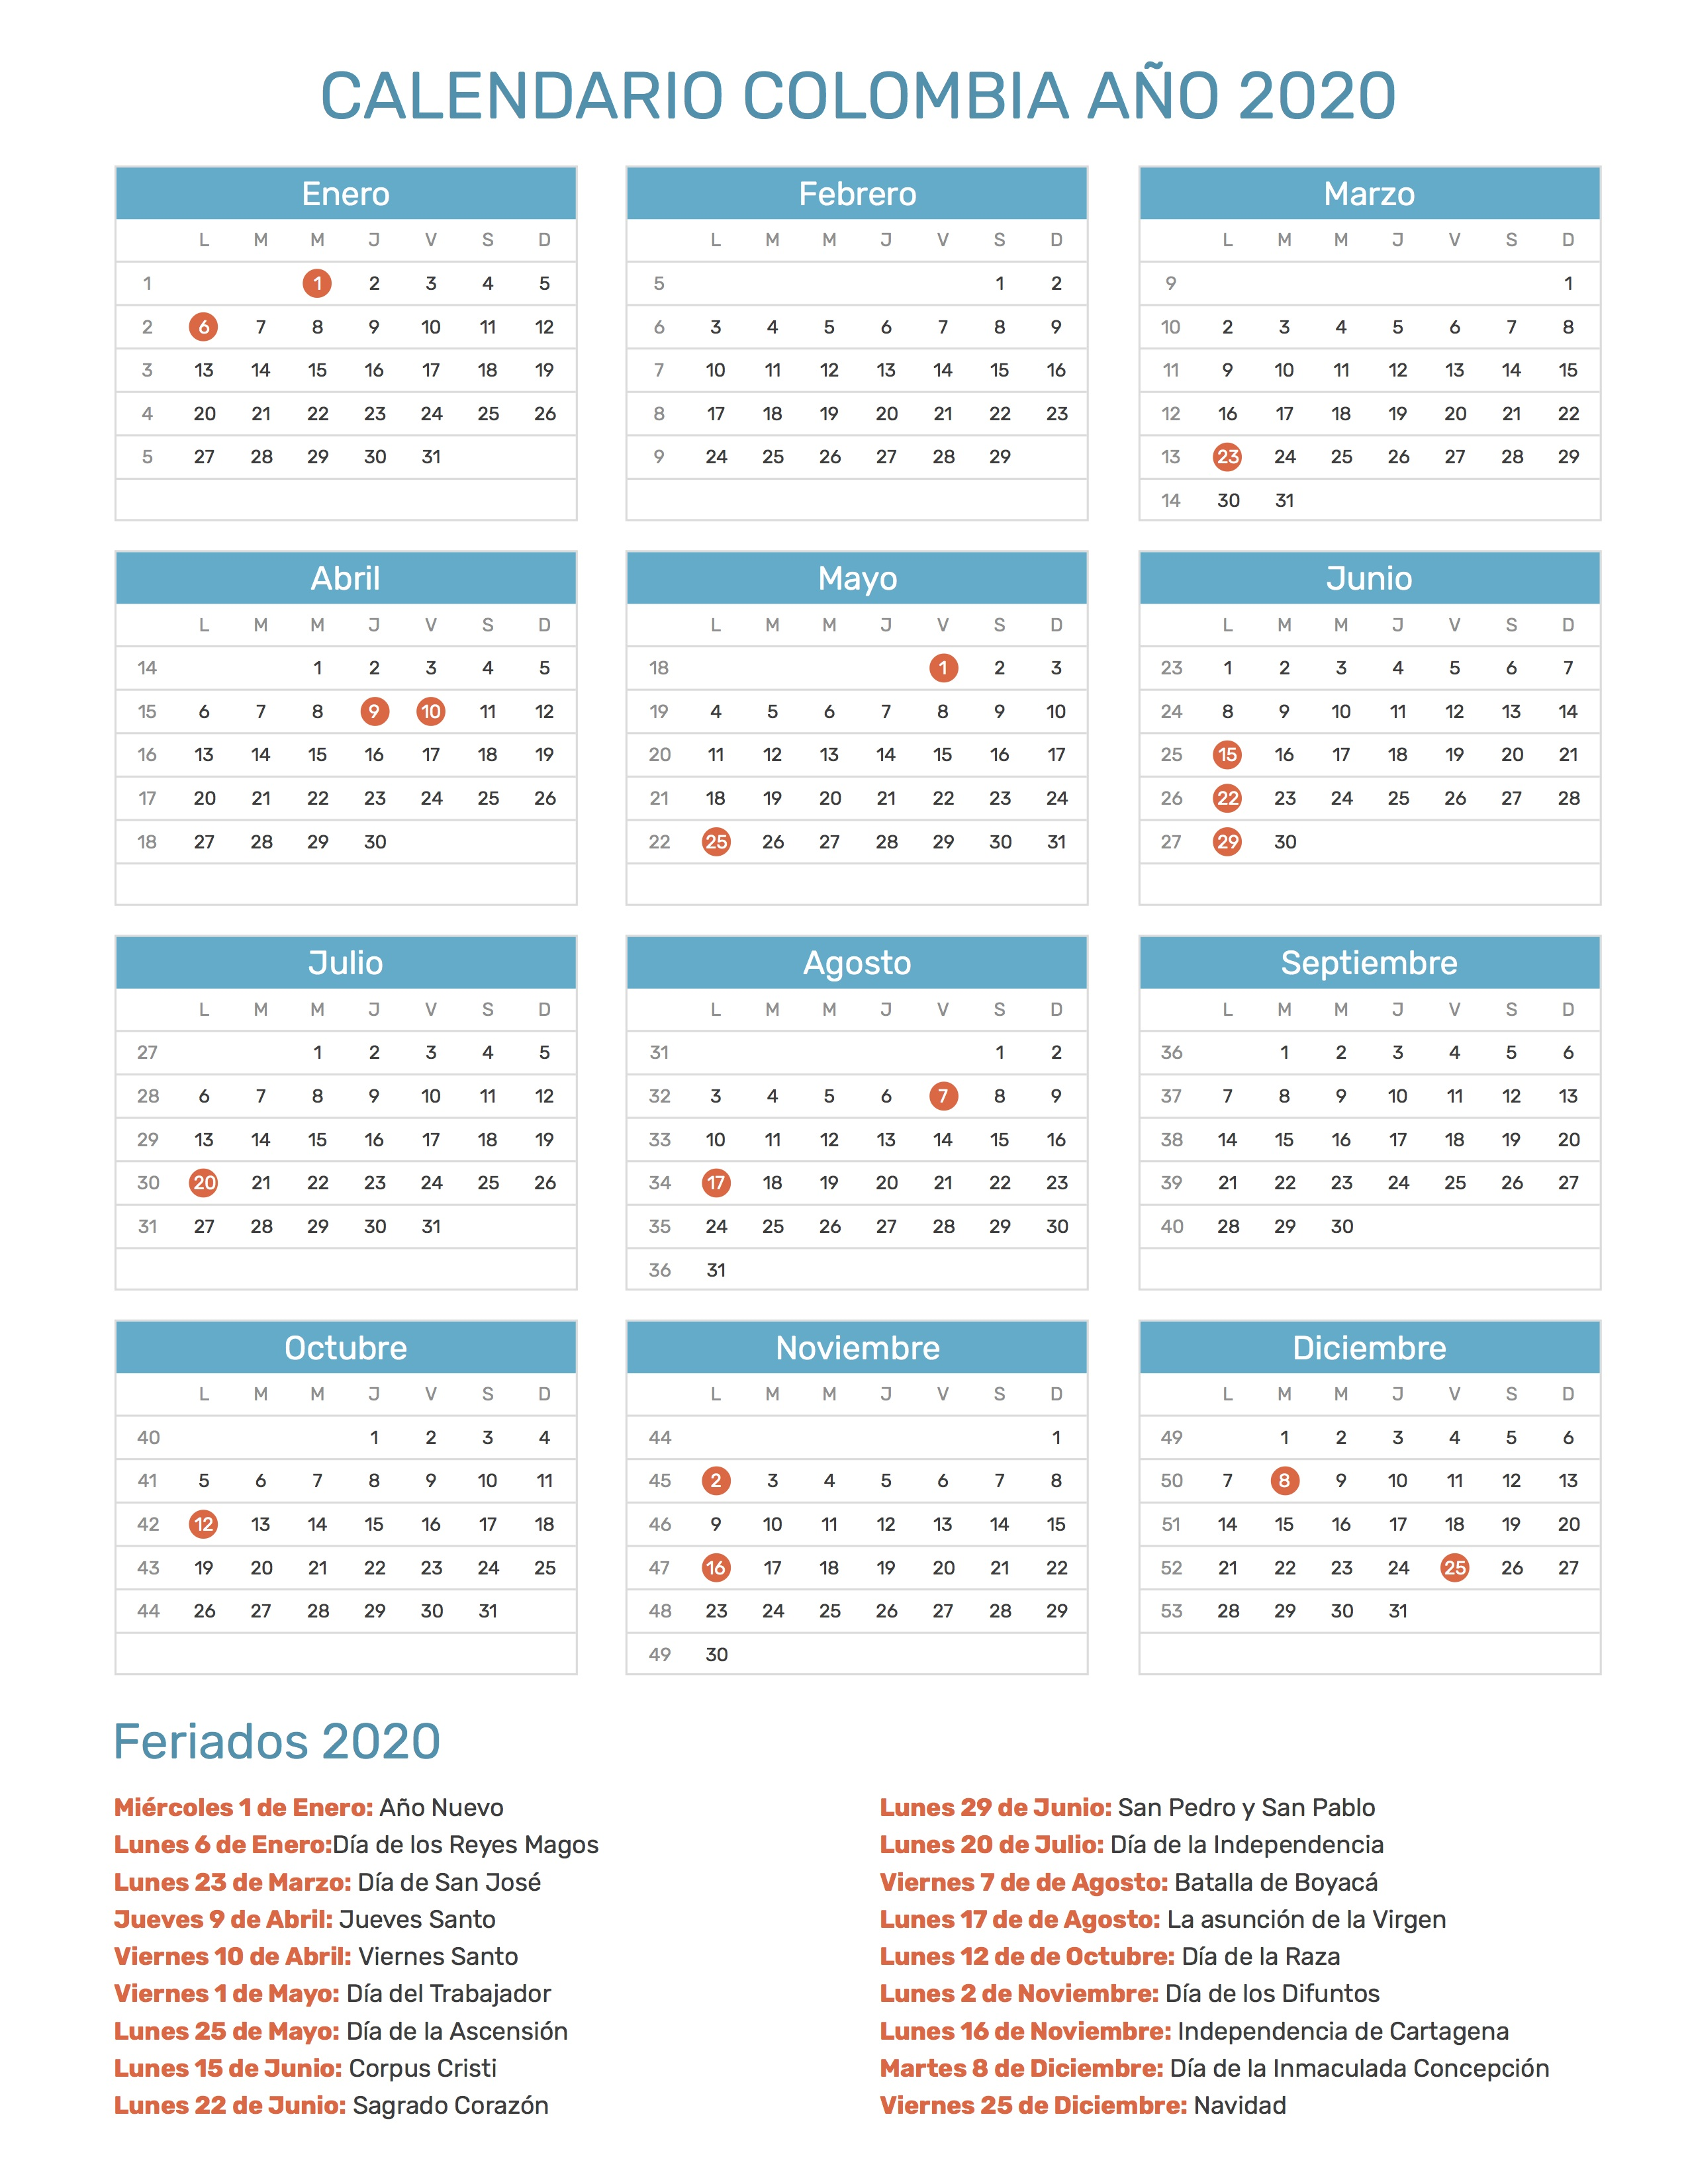 Calendario 2020 Argentina Para Imprimir Pdf.Calendario De Colombia Ano 2020 Feriados